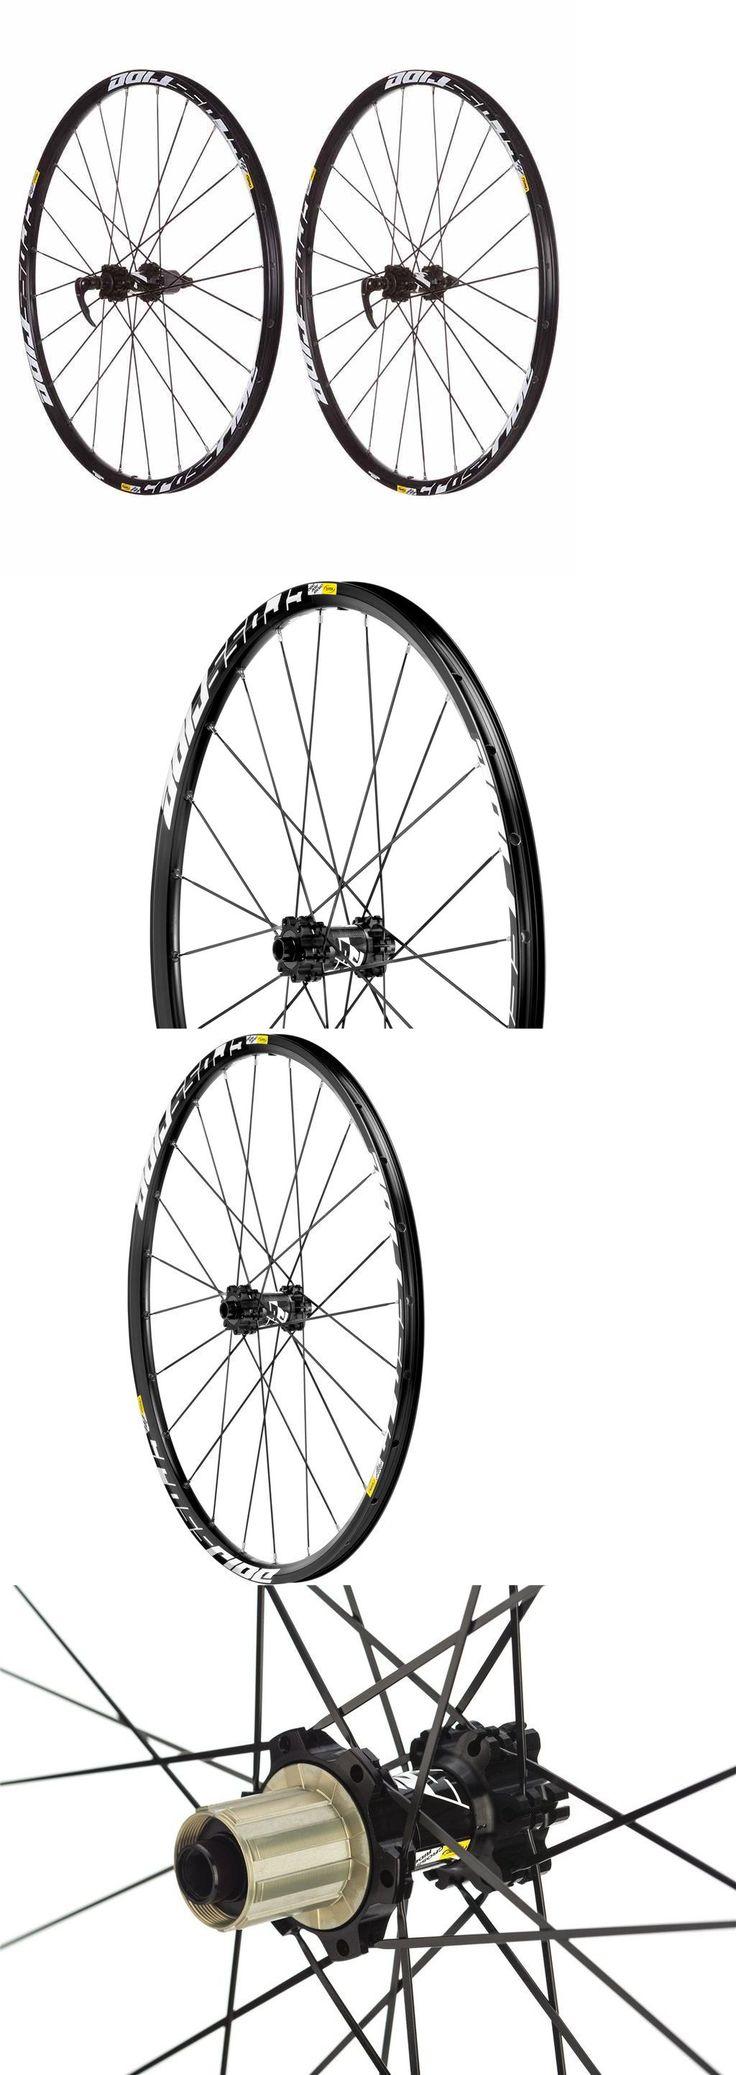 Wheels and Wheelsets 177830: Brand New Mavic Crossride Disc 26 27.5 29 Mtb Wheelset W Avid G3 Rotor -> BUY IT NOW ONLY: $159.9 on eBay!